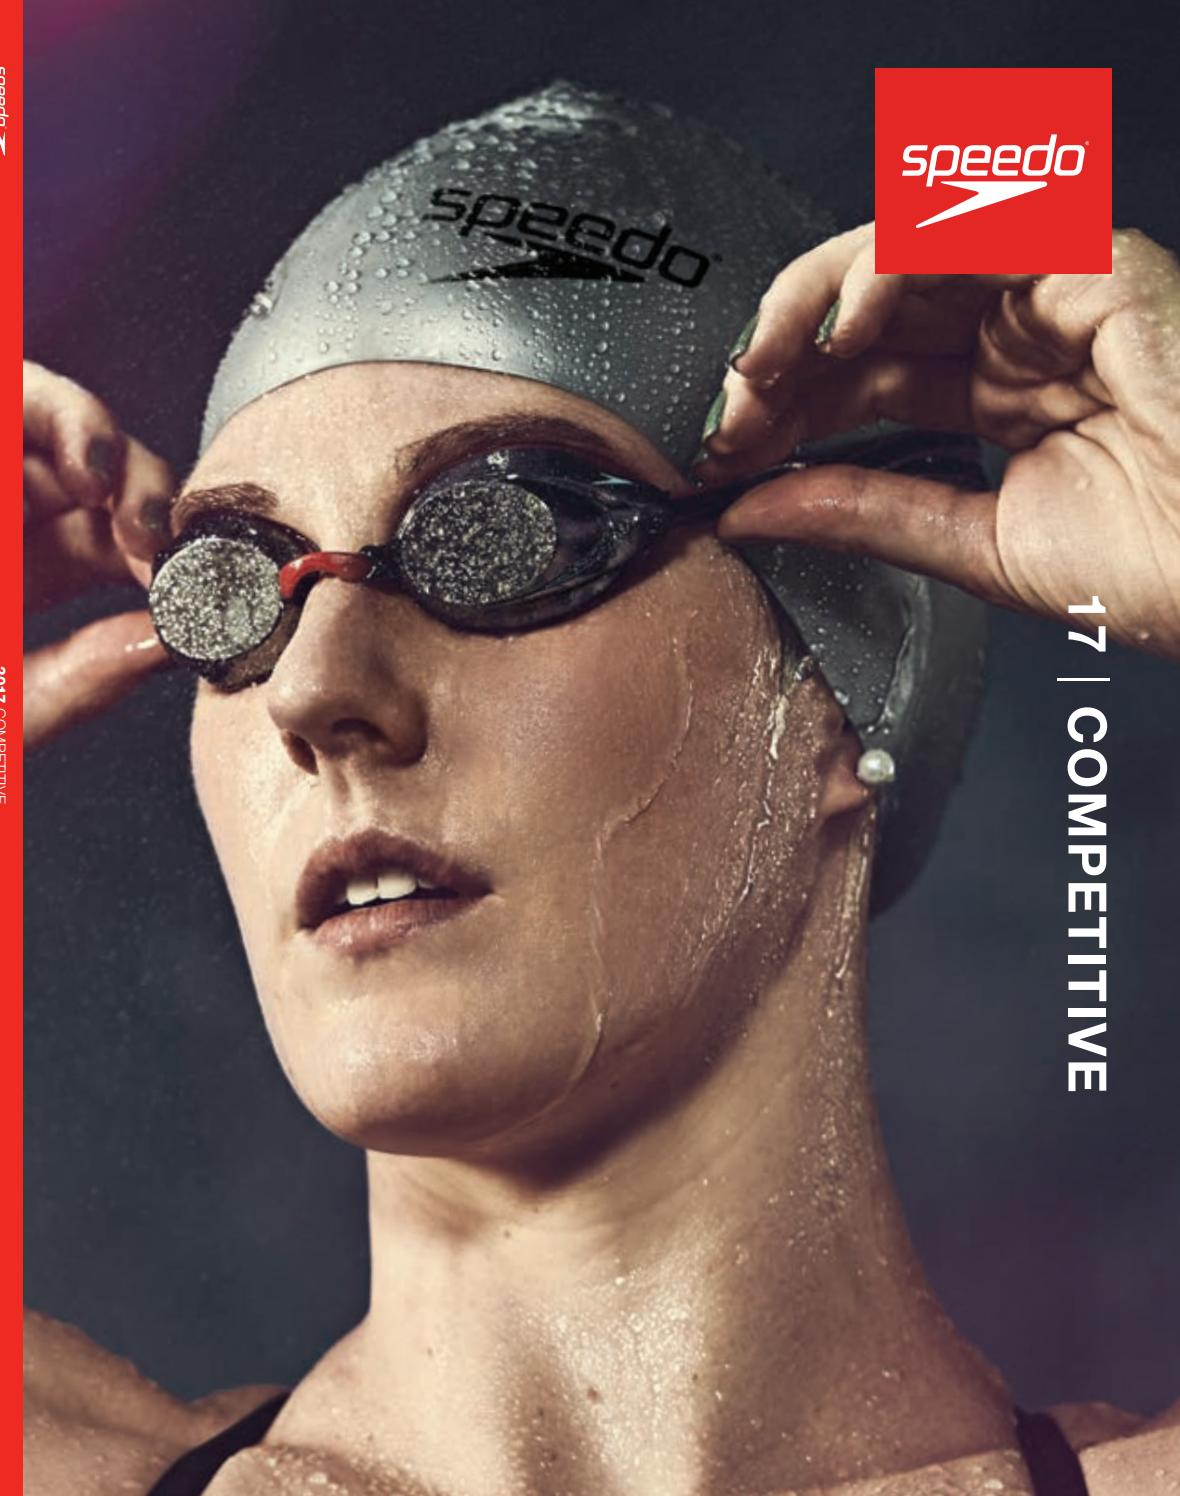 Speedo Mens Endurance Turbo Stroke Jammer Speedo Men/'s and Women/'s Swimwear 7705714-P